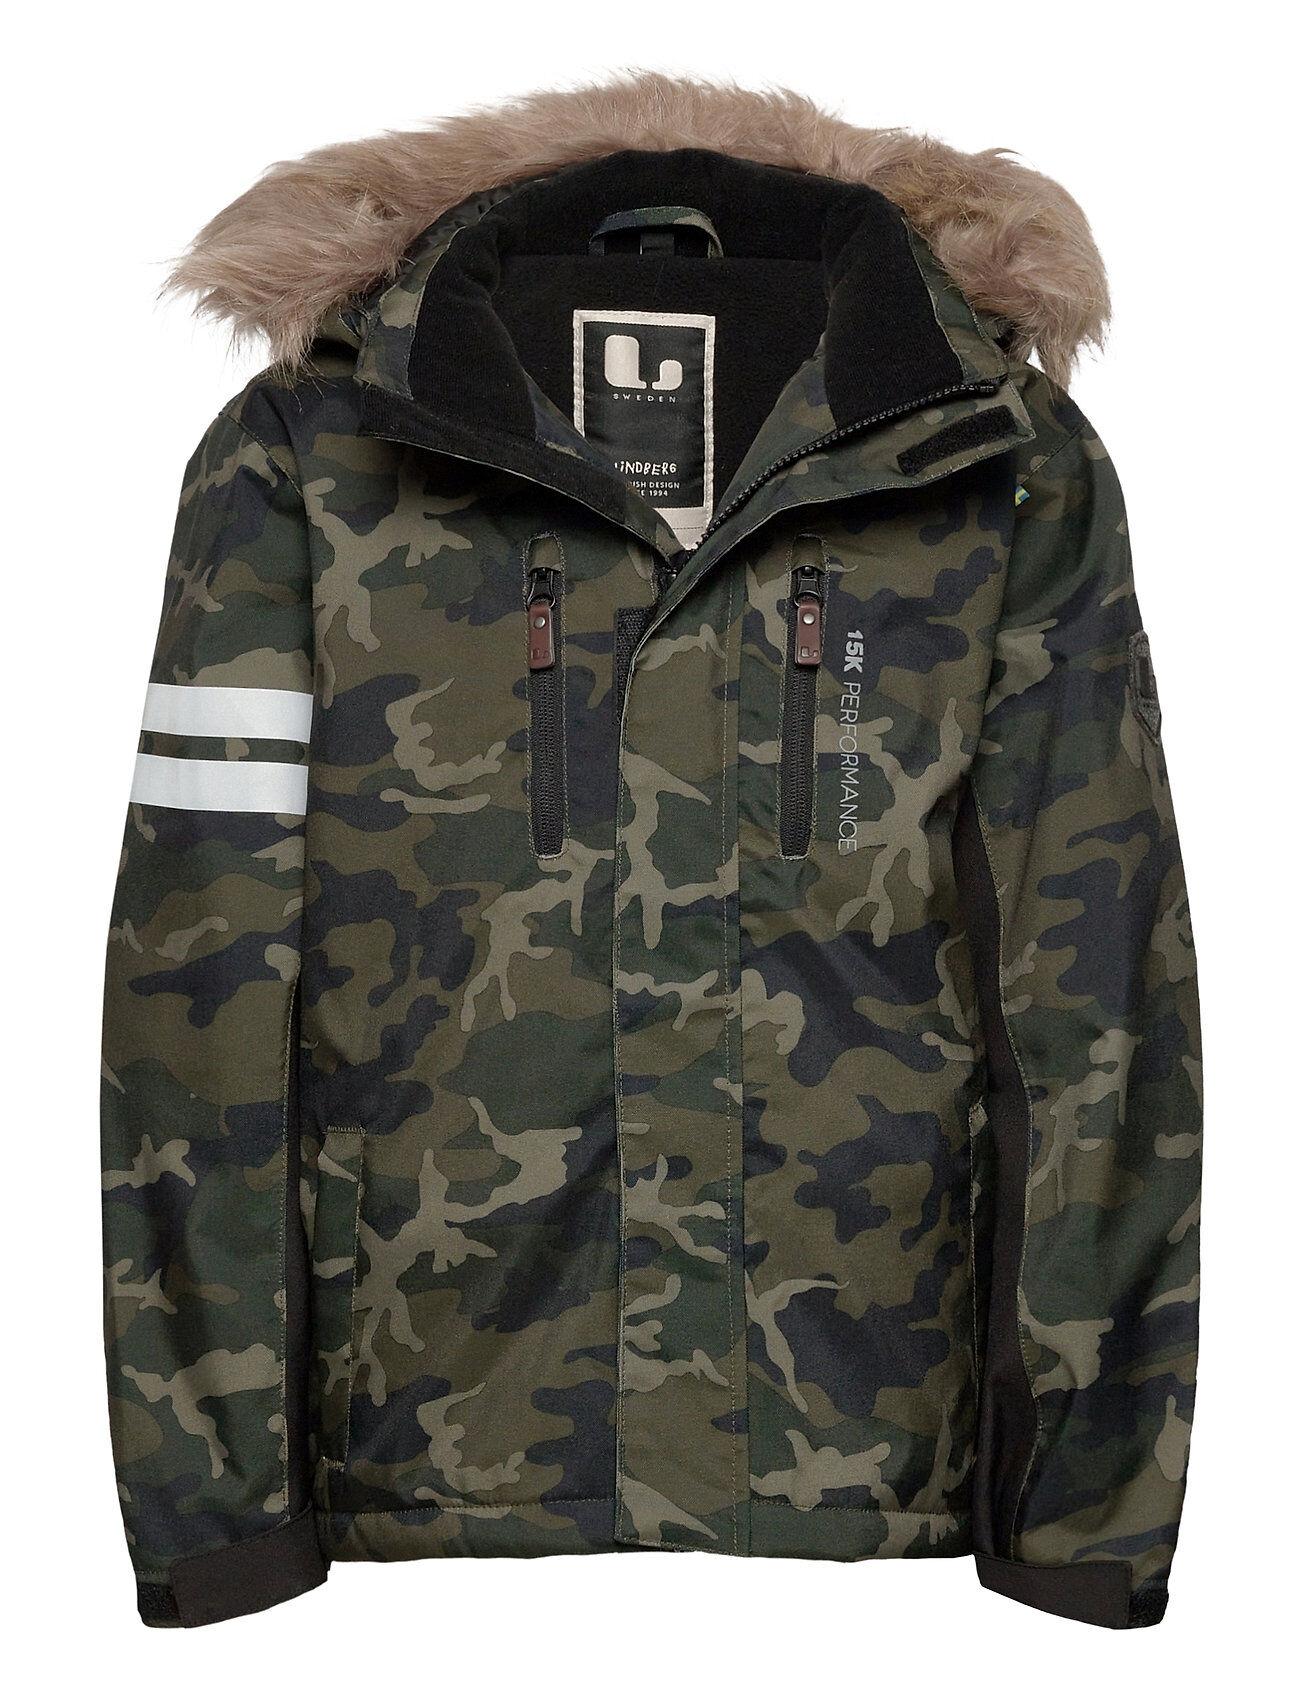 Lindberg Sweden Camo Jacket Outerwear Snow/ski Clothing Snow/ski Jacket Vihreä Lindberg Sweden